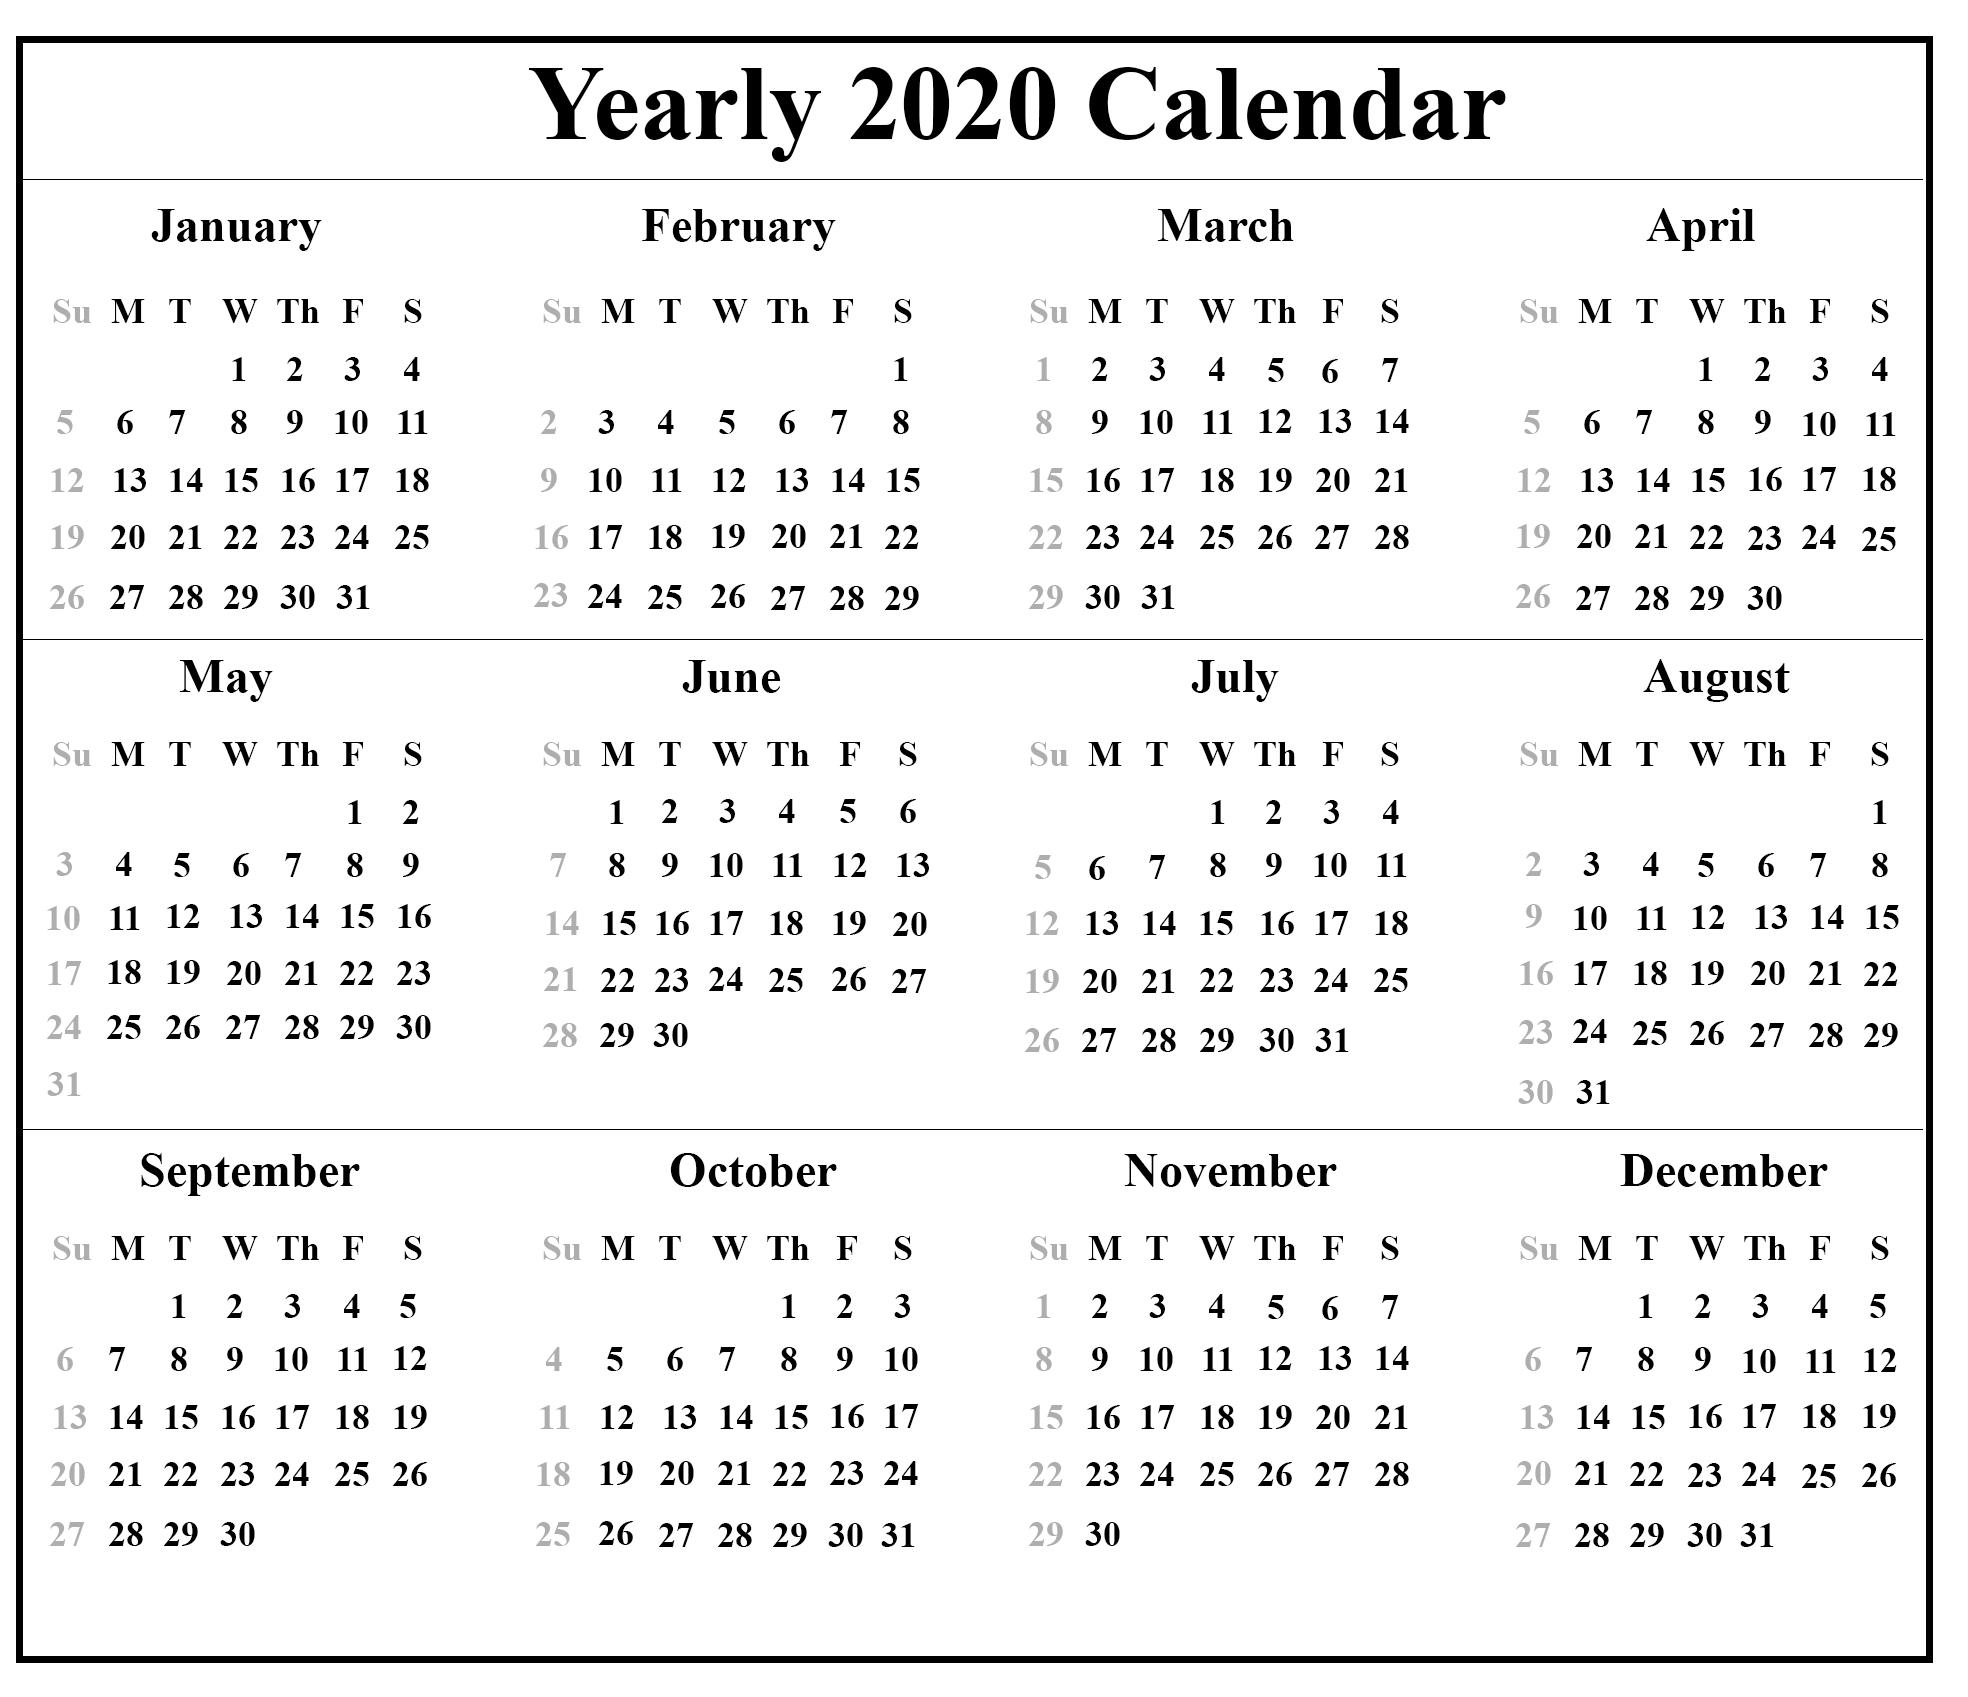 Calendar 2020 Download - Colona.rsd7 Printable Chinese Lunar Calendar 2020